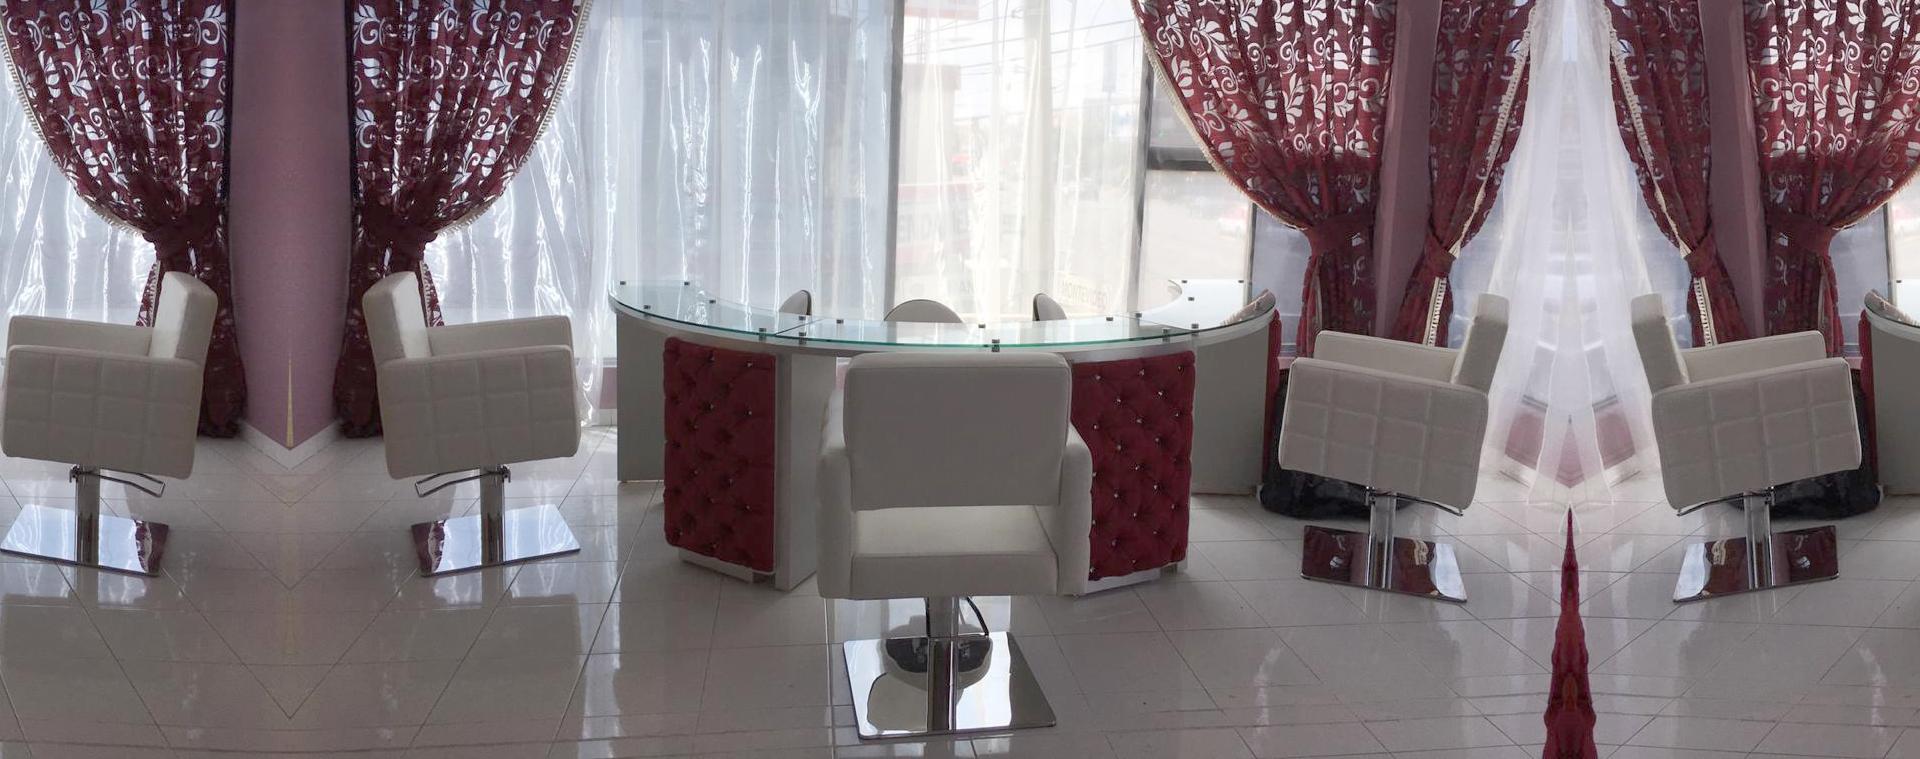 Wizar Muebles Para Estetica - Muebles Para Estetica Muebles Otero[mjhdah]https://mueblesderodri.com/wp-content/uploads/2017/12/mueblesderodri.com_bc91_DeRodri_home1_1600_500.jpeg